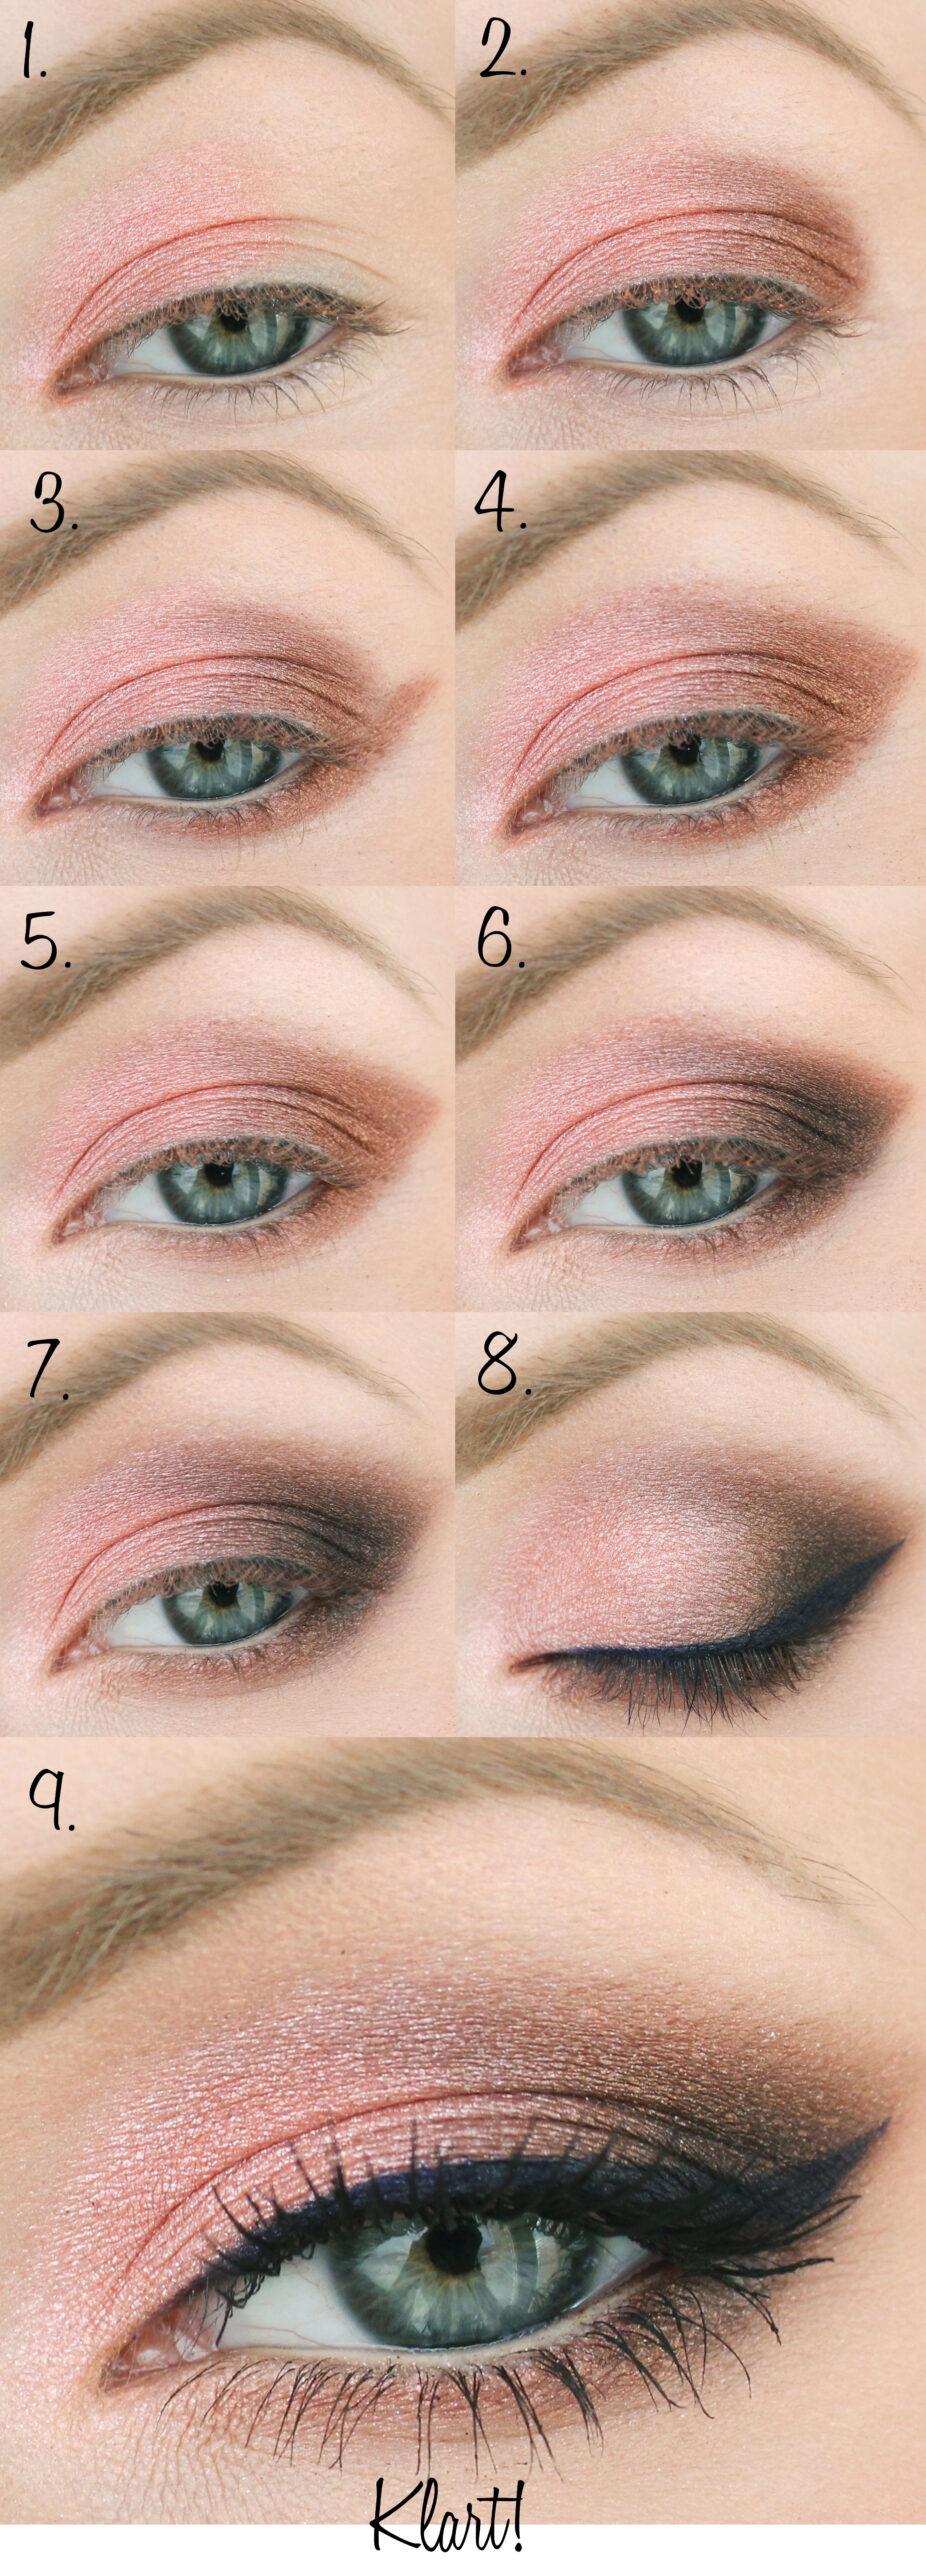 paleta de maquillaje de verano paso a paso 40